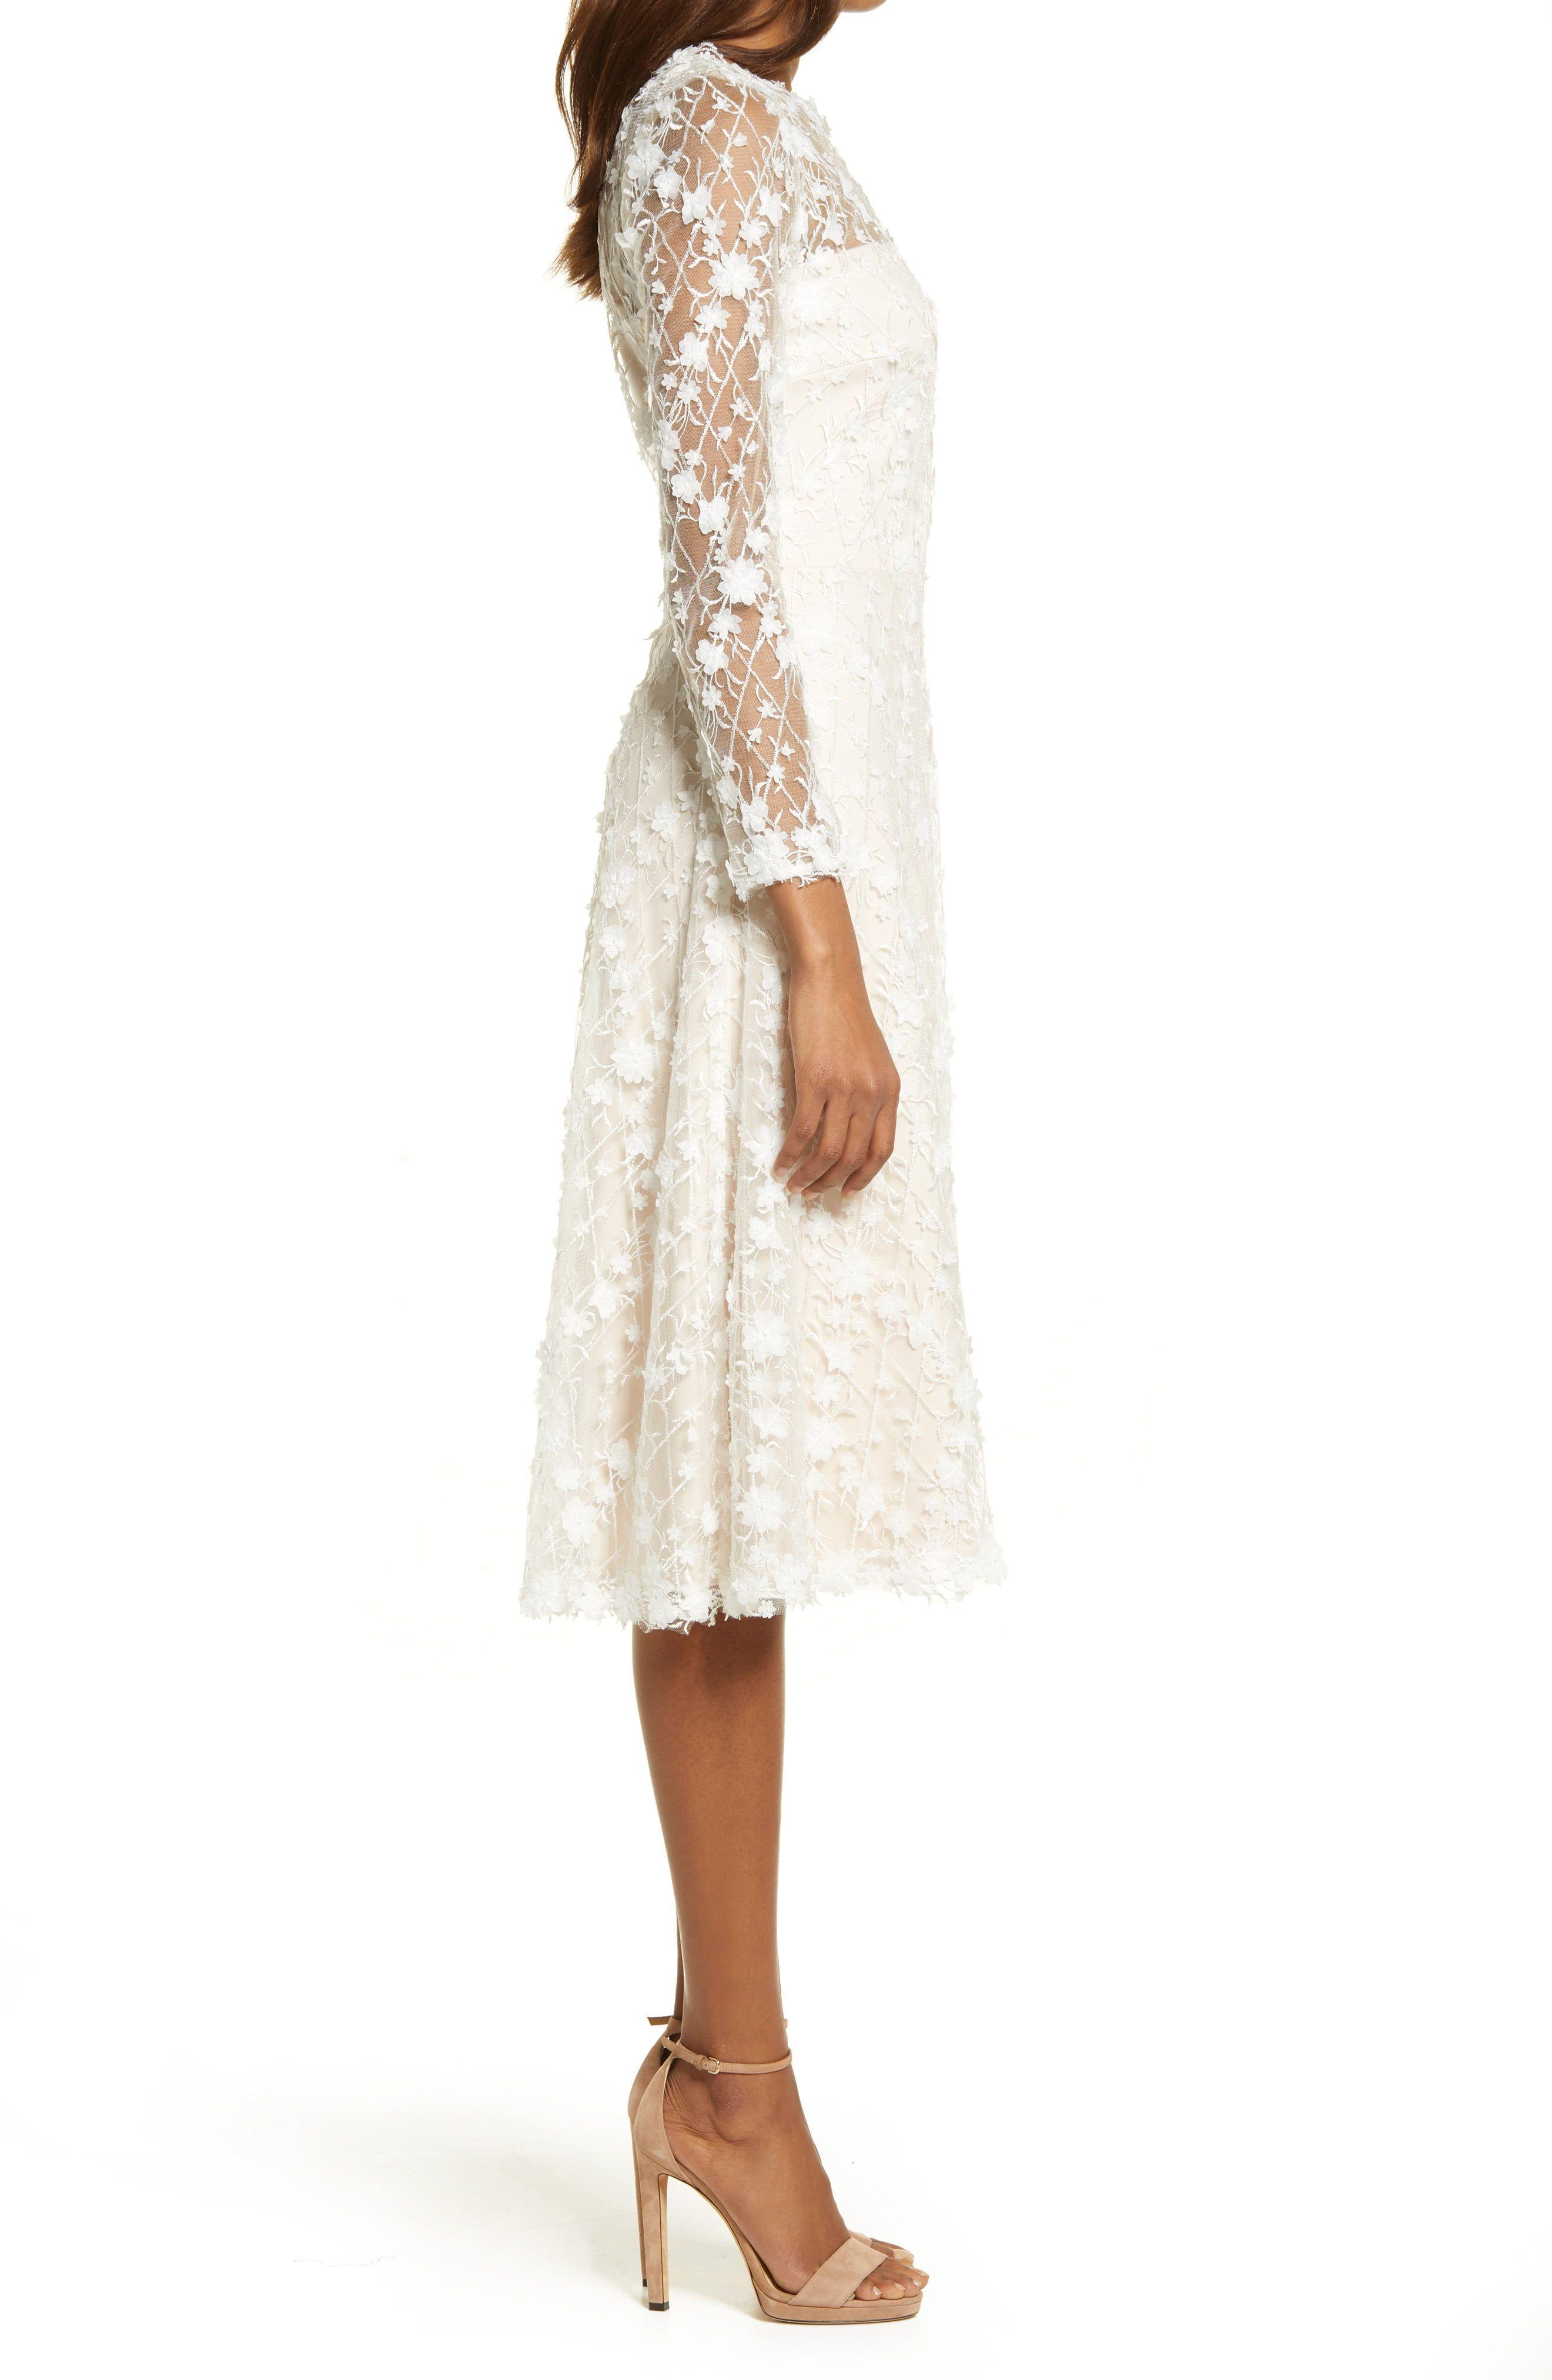 Tadashi Shoji Long Sleeve Lace Cocktail Dress Nordstrom In 2021 Cocktail Dress Lace Nordstrom Dresses Long Sleeve Lace Cocktail Dress [ 4048 x 2640 Pixel ]